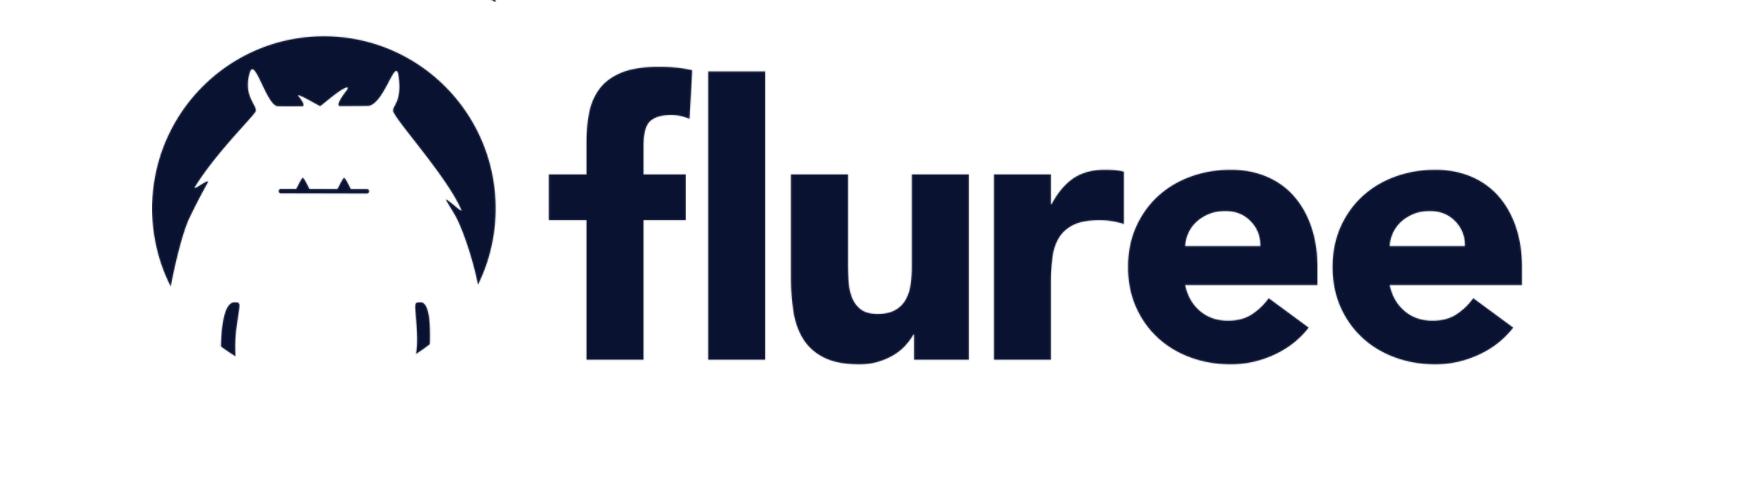 Fluree